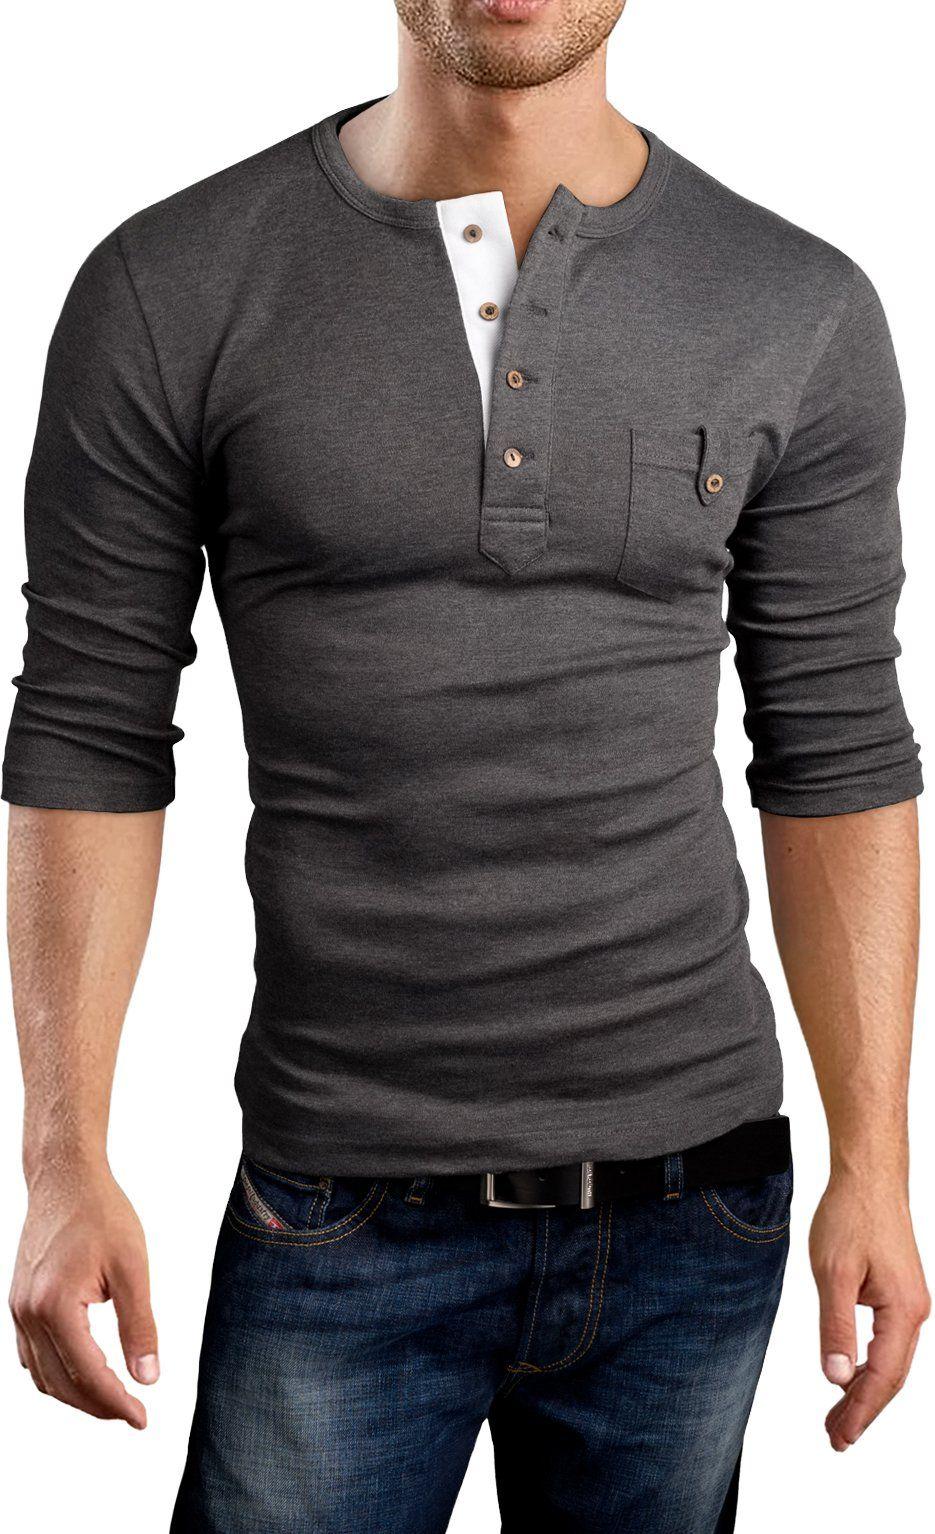 173a4256 Grin&Bear Slim Fit 3/4 Sleeve Henley Shirt T-Shirt, charcoal, M, BH108